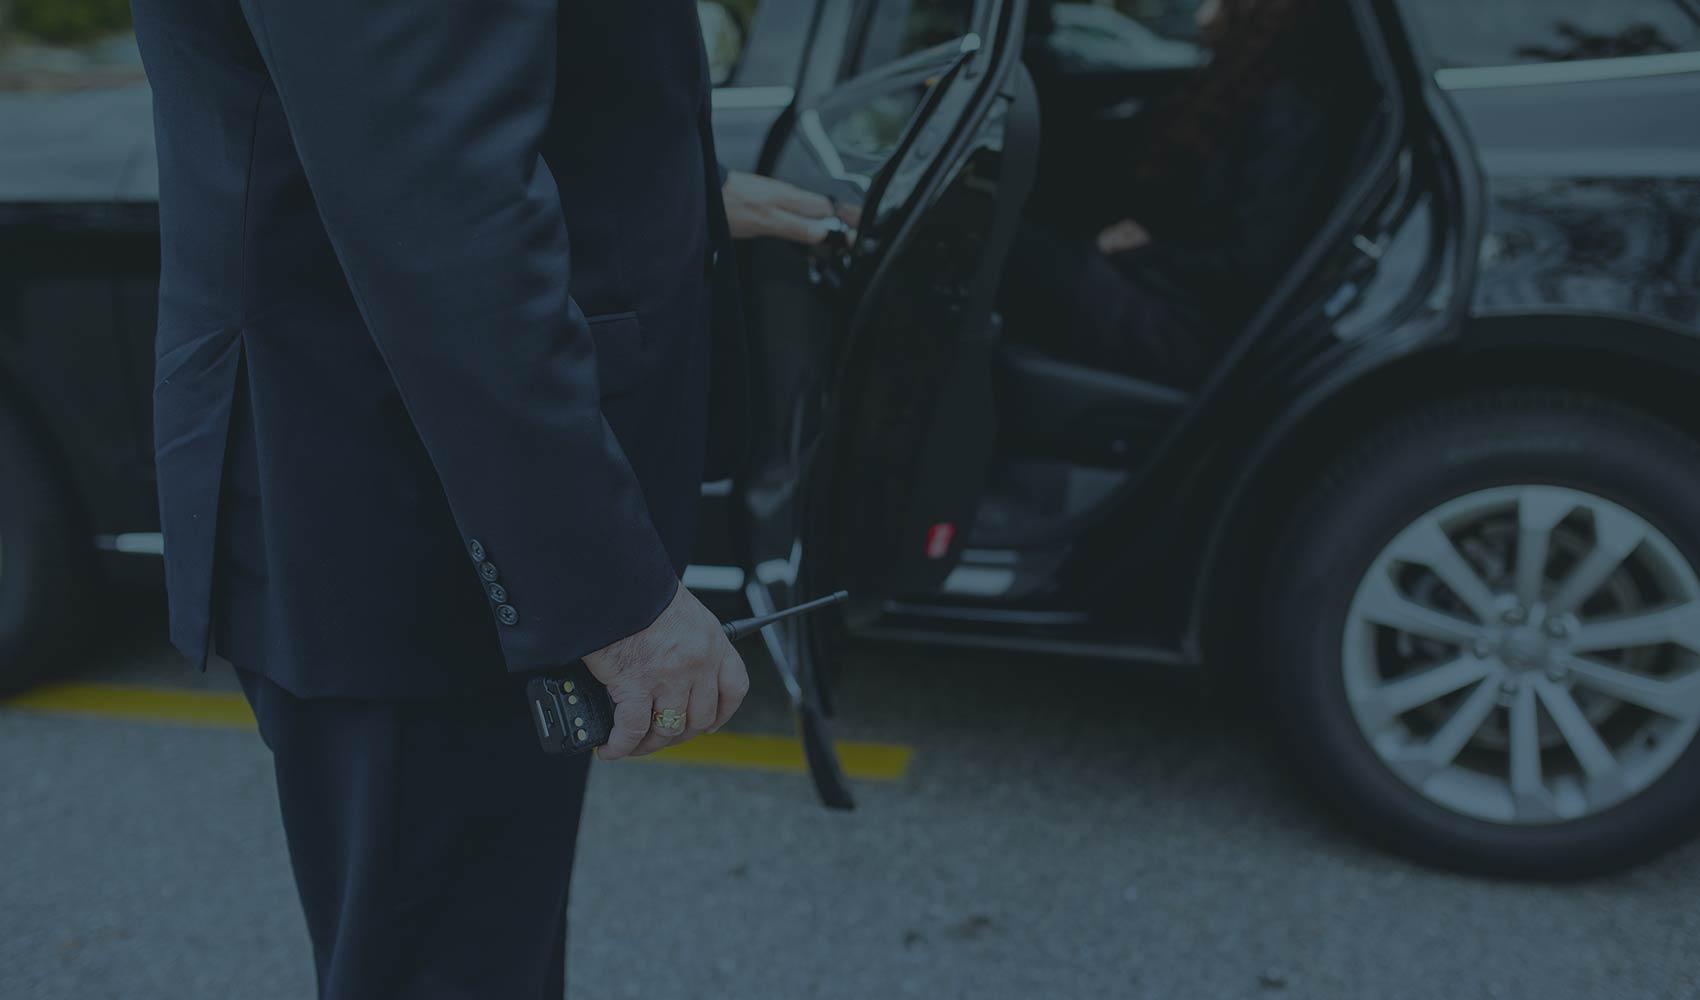 executive protection, executive protection services, bodyguard service